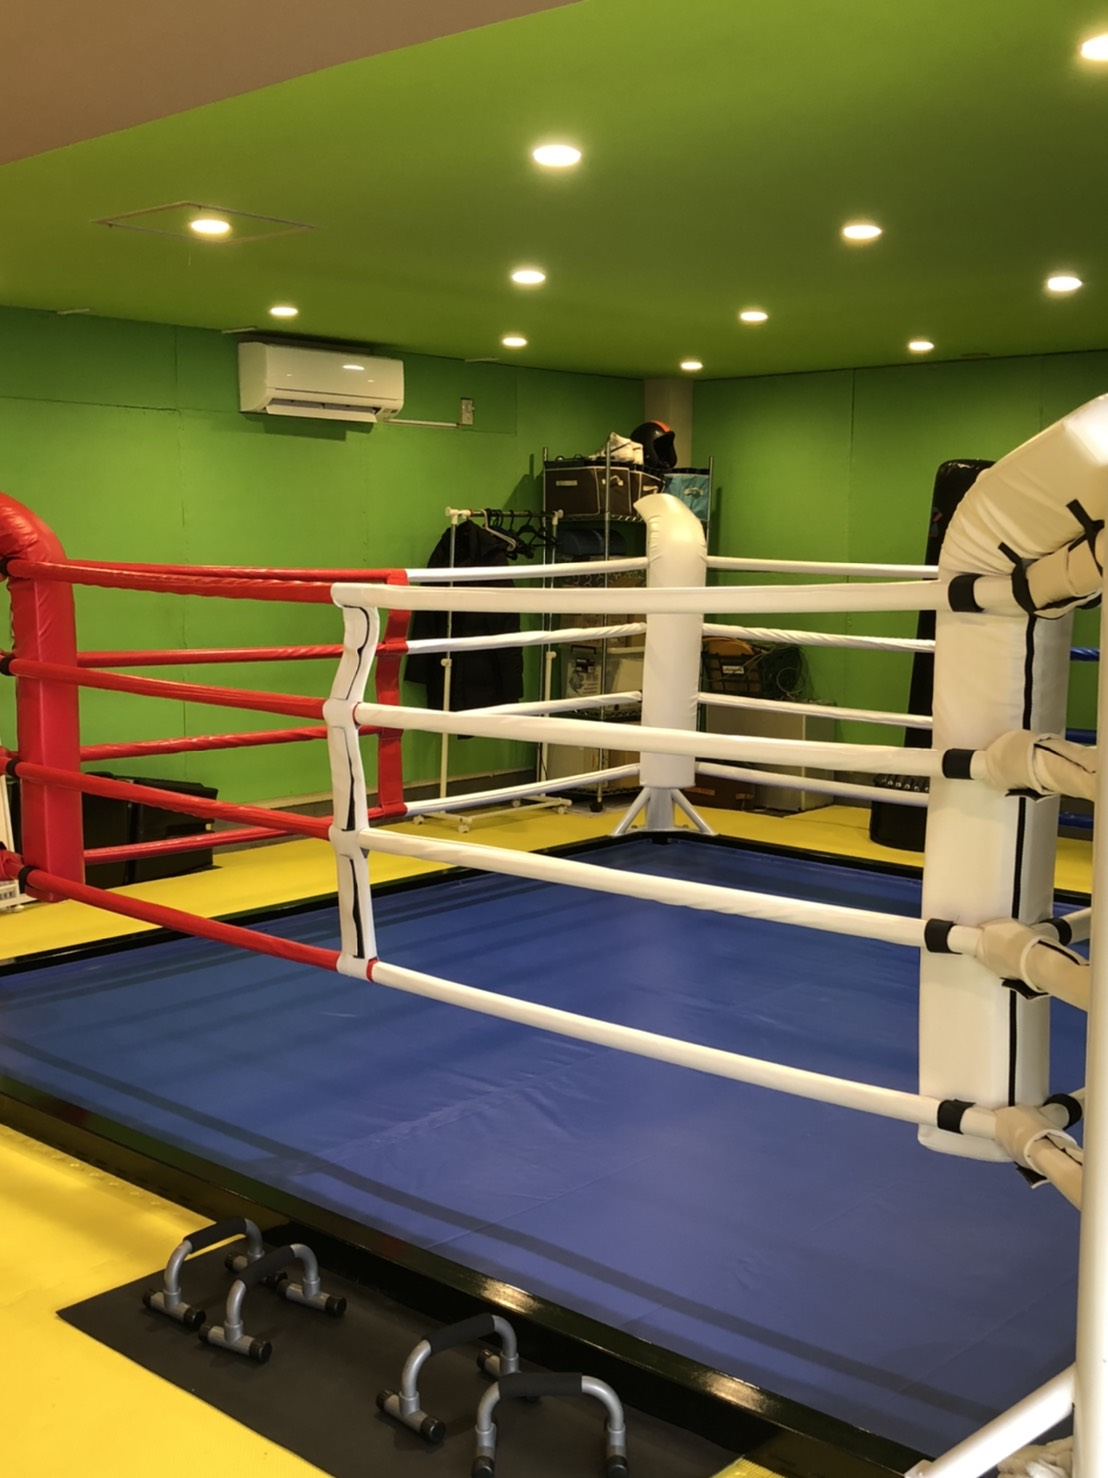 ring1 キックボクシングジム。ベストキッド東京。杉並区方南・高円寺/渋谷区笹塚エリアで運動不足解消。